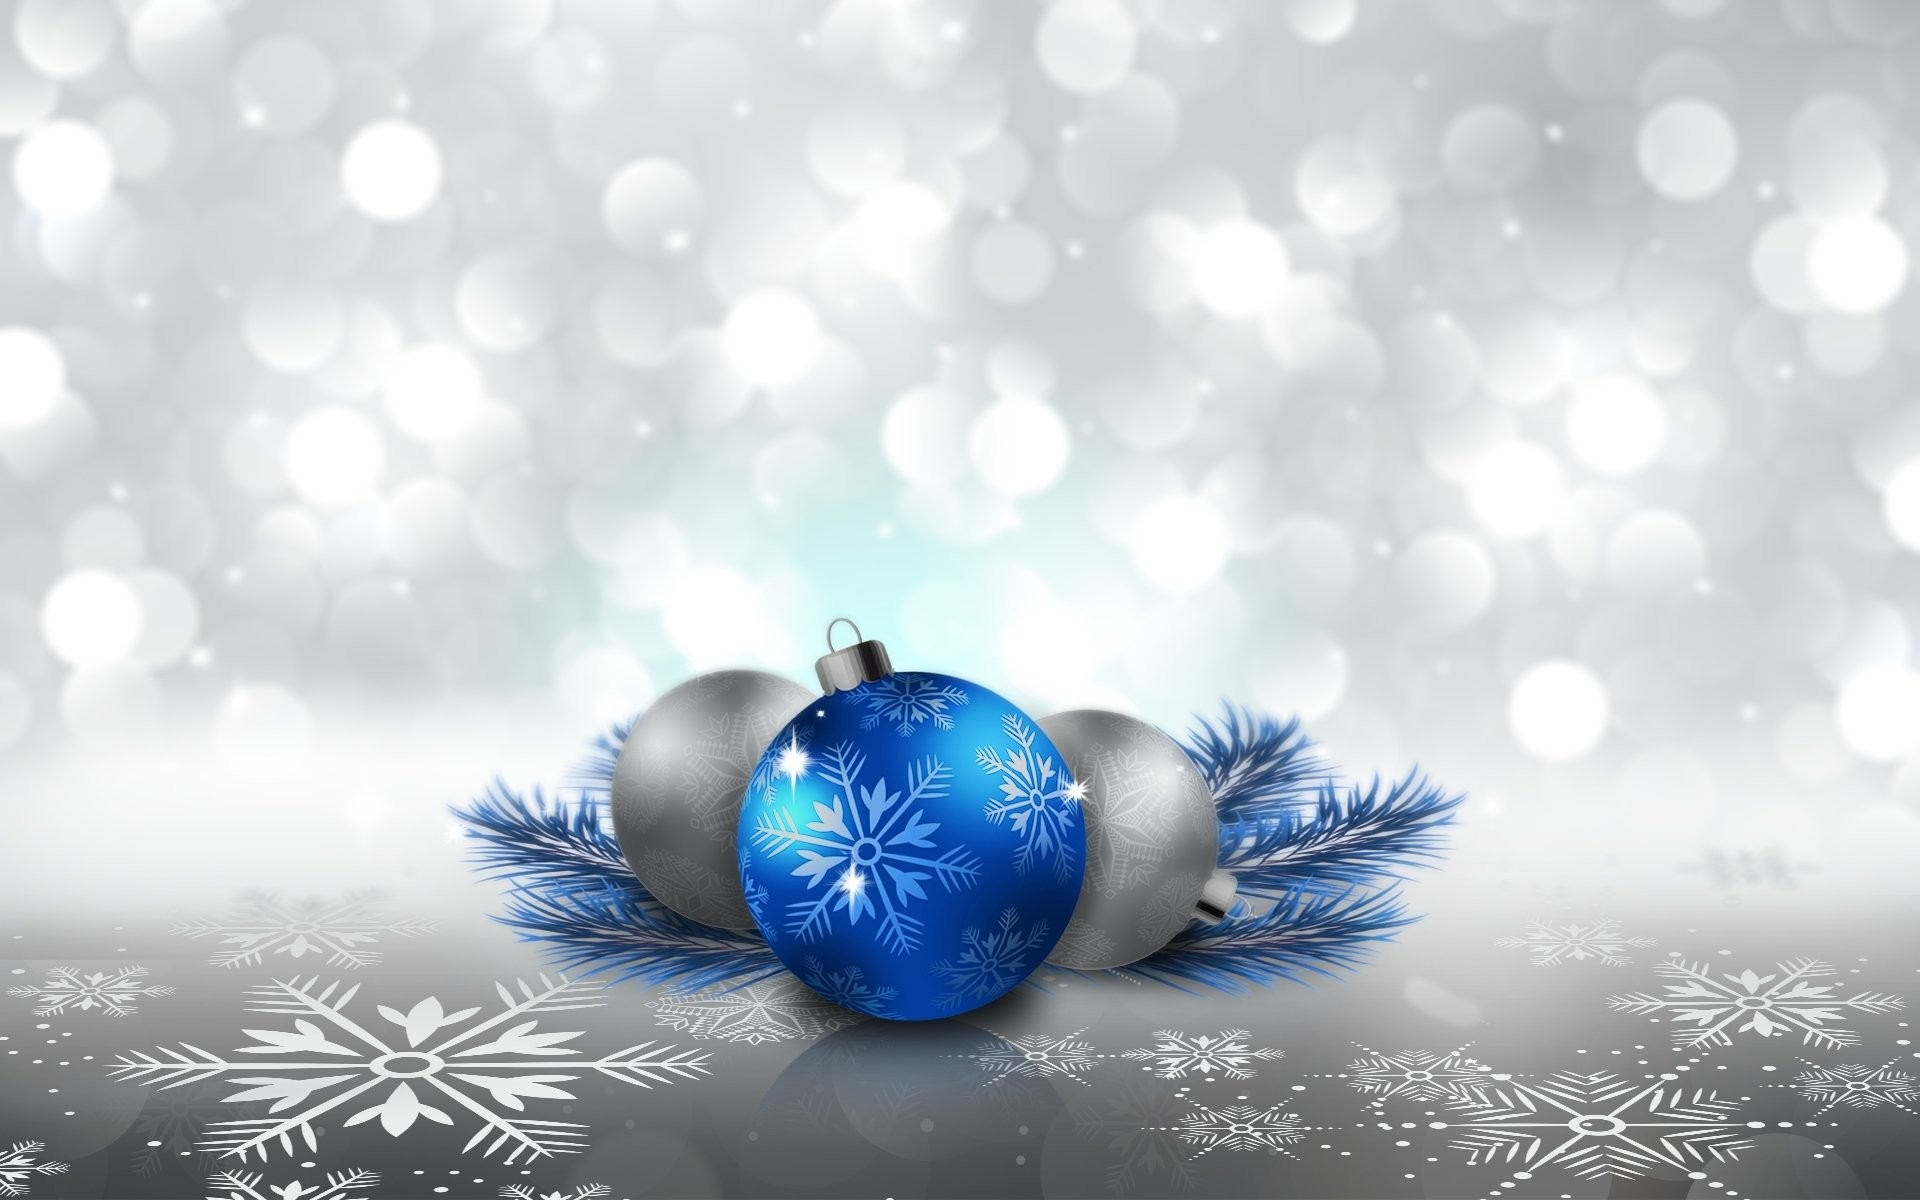 Holiday – Christmas Holiday Christmas Ornaments Blue Silver Snowflake  Wallpaper